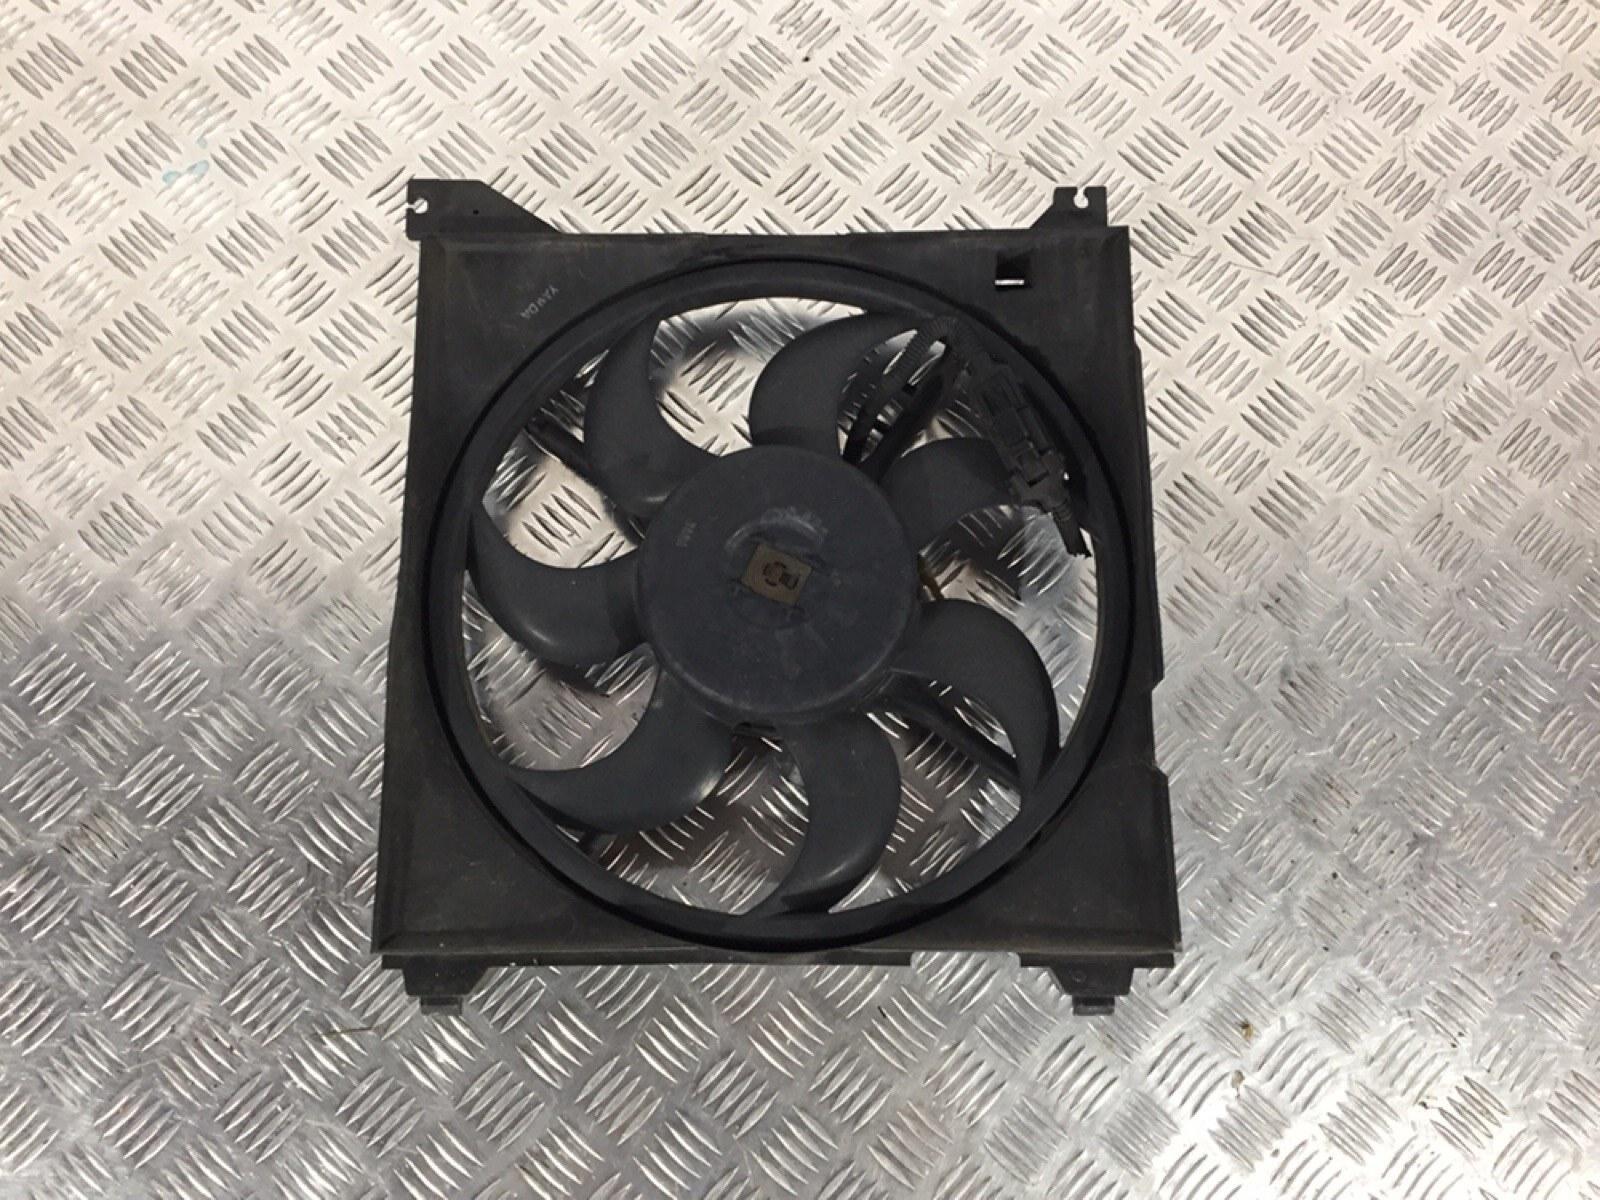 Вентилятор радиатора Hyundai Santa Fe 2.0 CRDI 2003 (б/у)